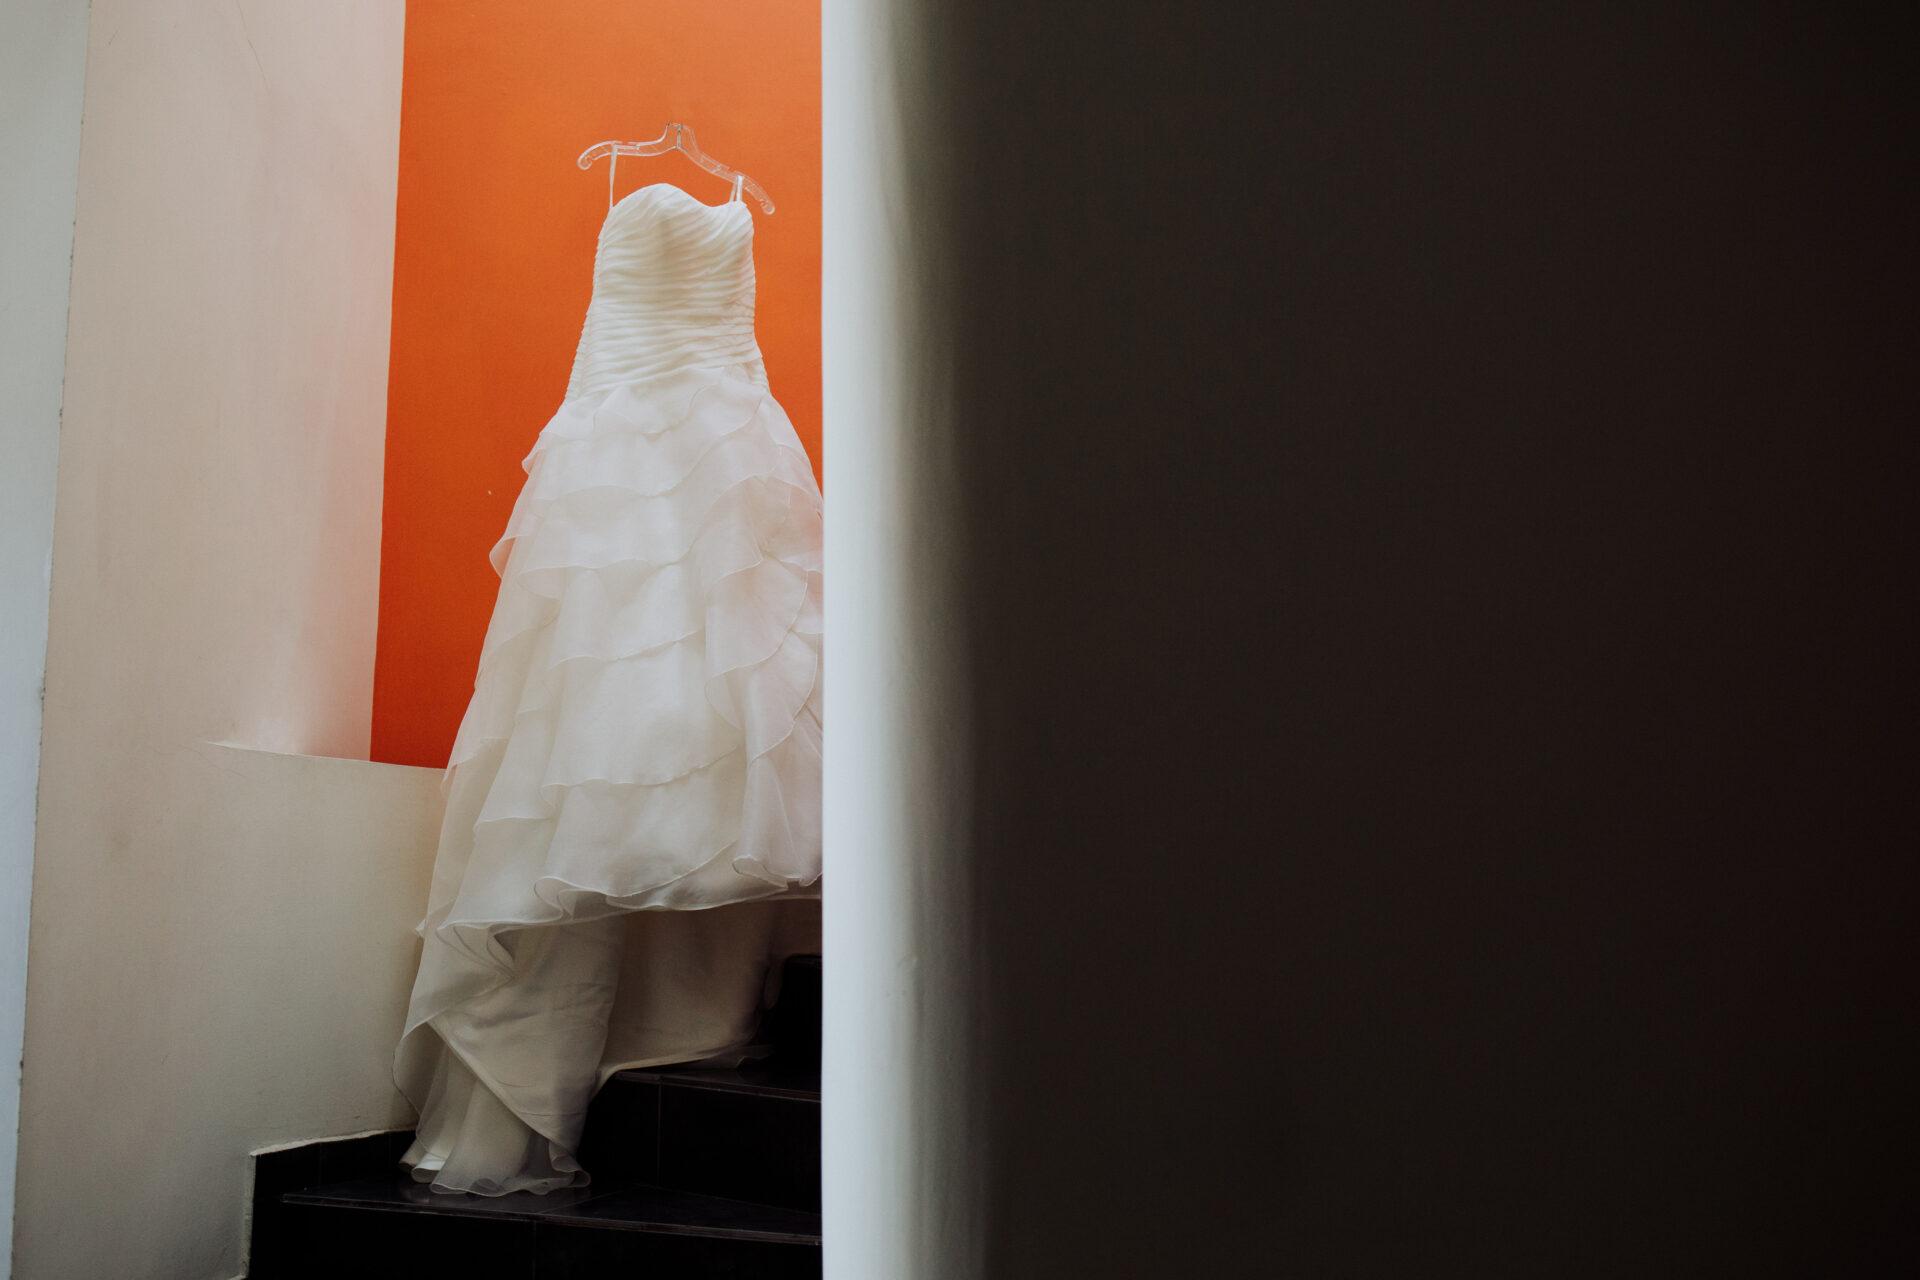 javier_noriega_fotografo_bodas_gaviones_zacatecas_wedding_photographer2